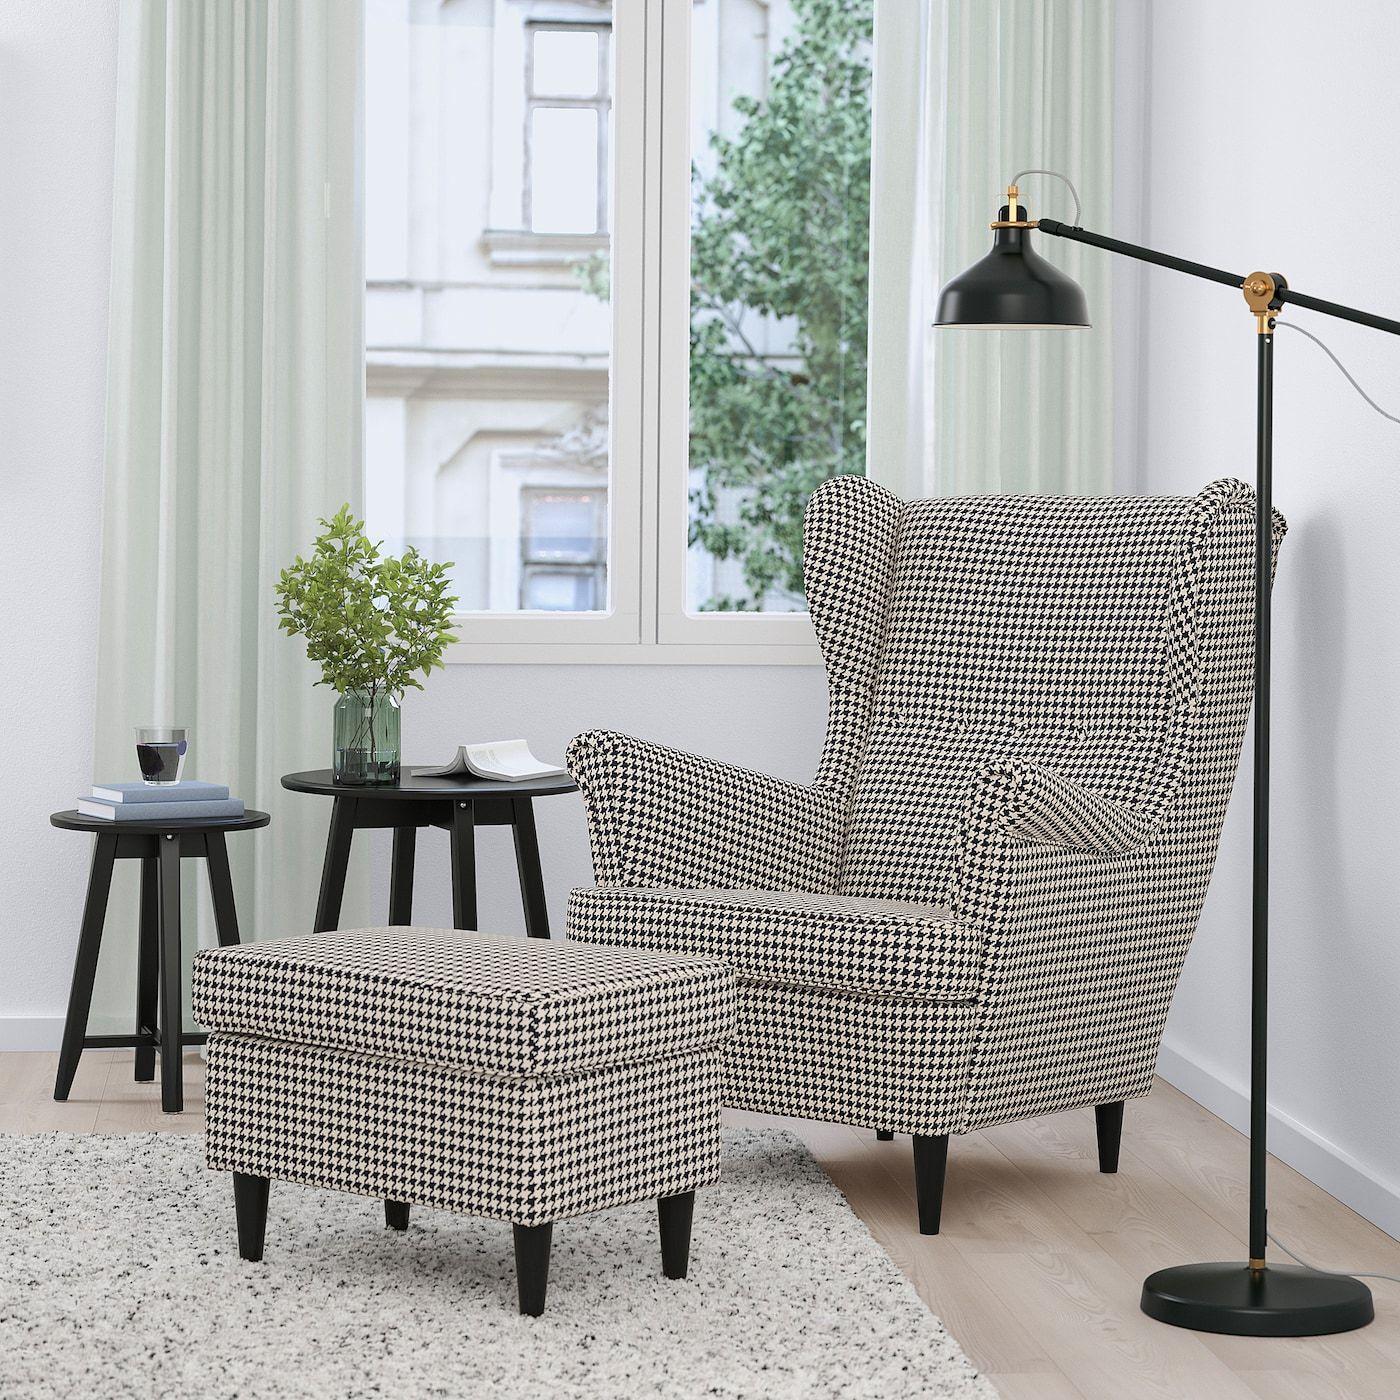 Strandmon Ohrensessel Vibberbo Schwarz Beige Ikea Deutschland In 2020 Wing Chair Ikea Strandmon Living Room Colors